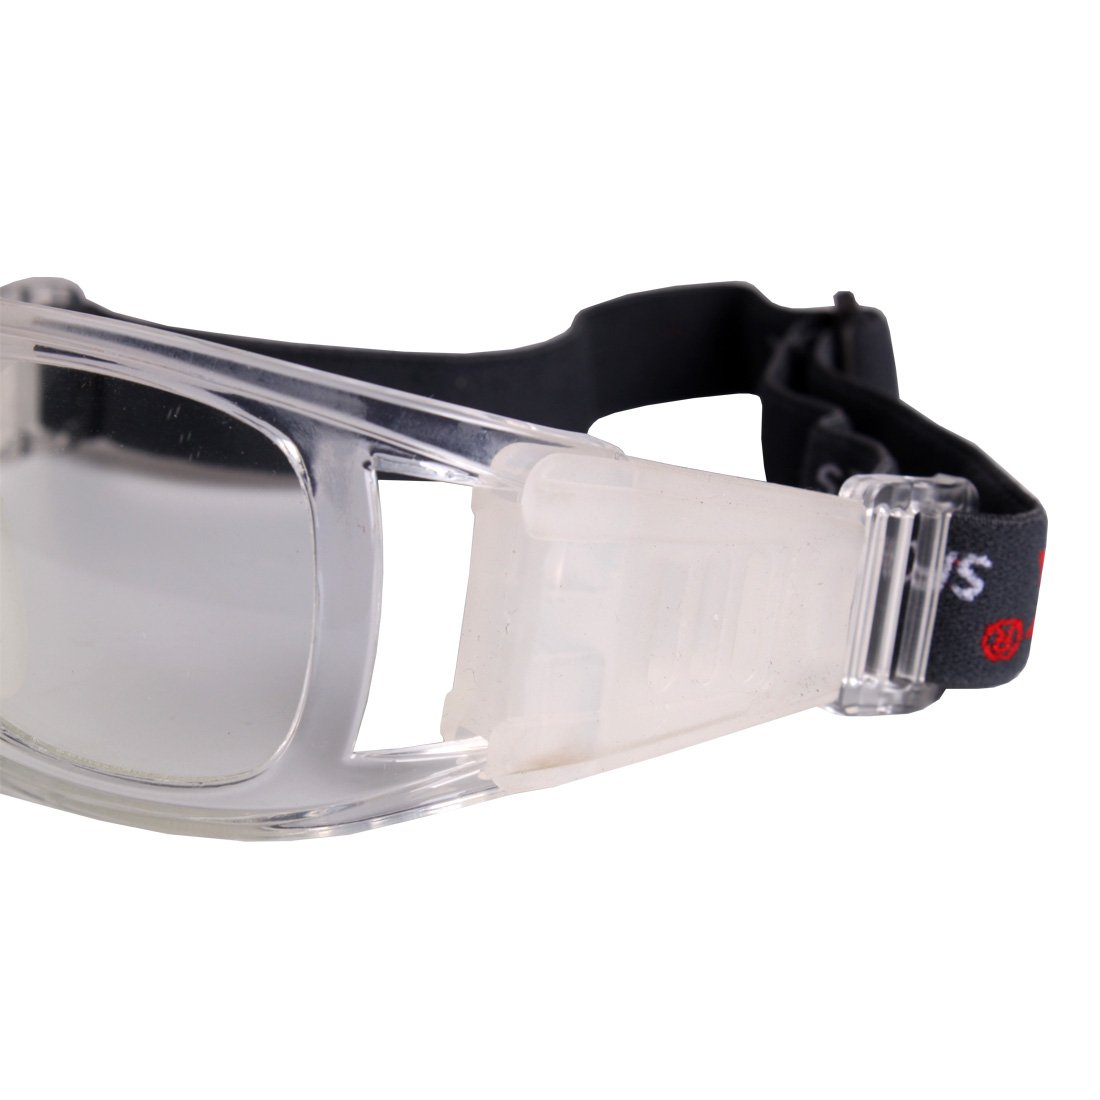 a01bfff6ec07 Andux Basketball Soccer Football Sports Protective Eyewear Goggles Eye  Safety Glasses LQYJ-01 (White)